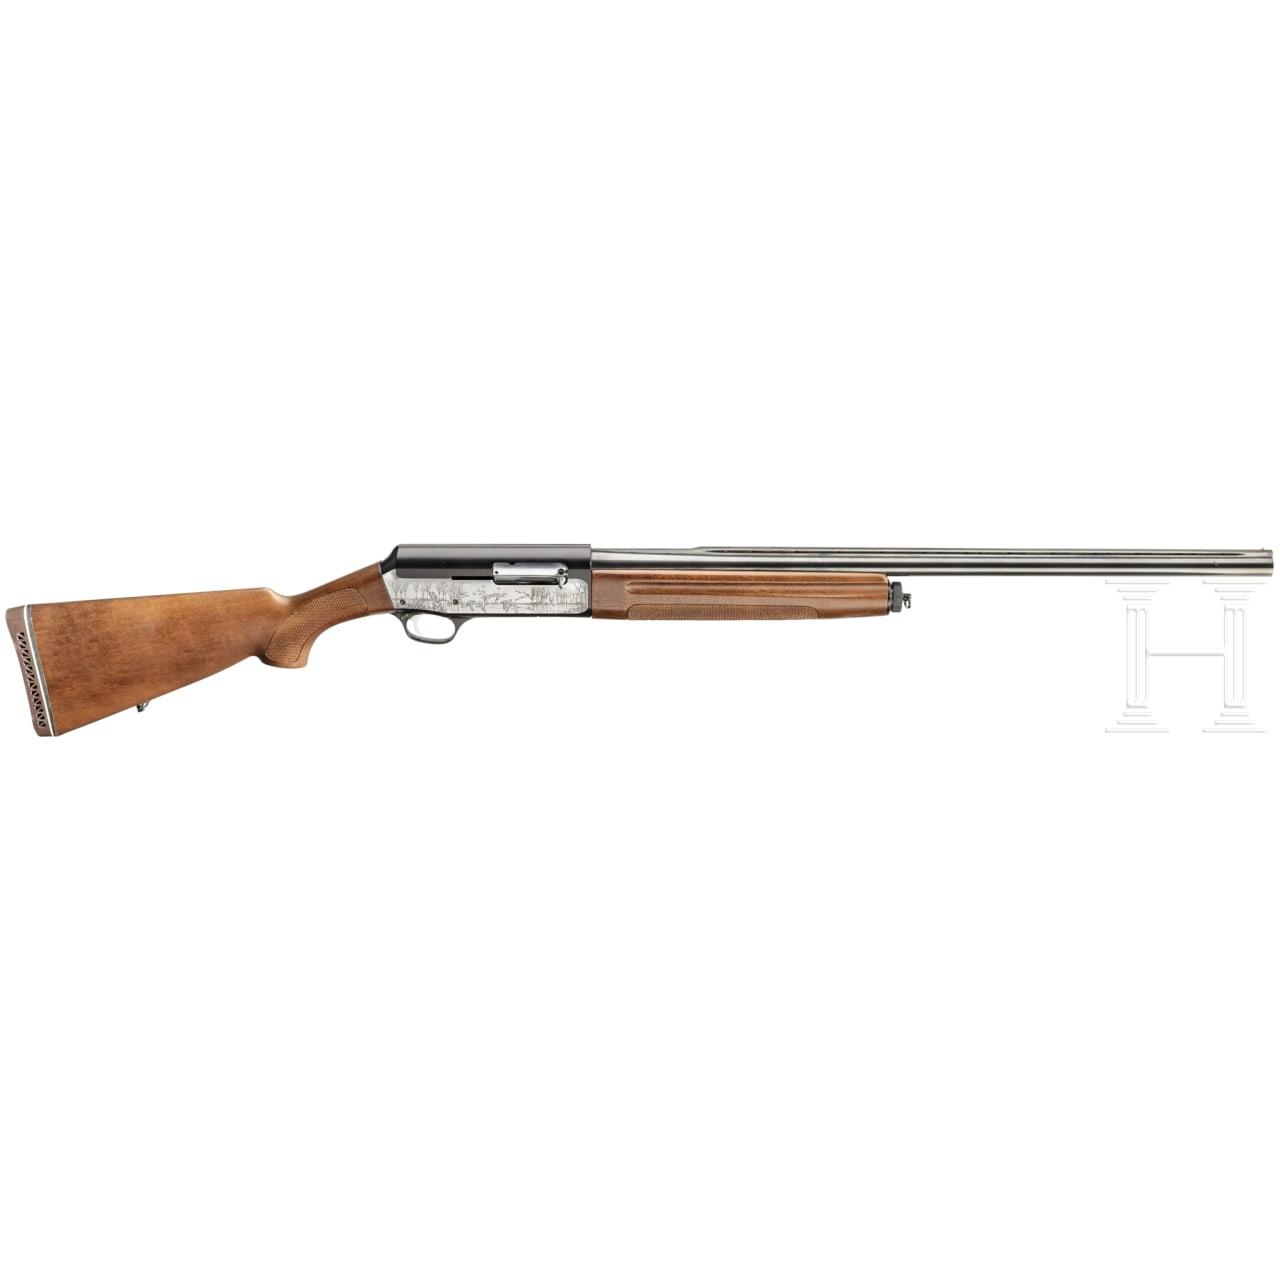 A semi-auto shotgun by Franchi, Mod. Hunter